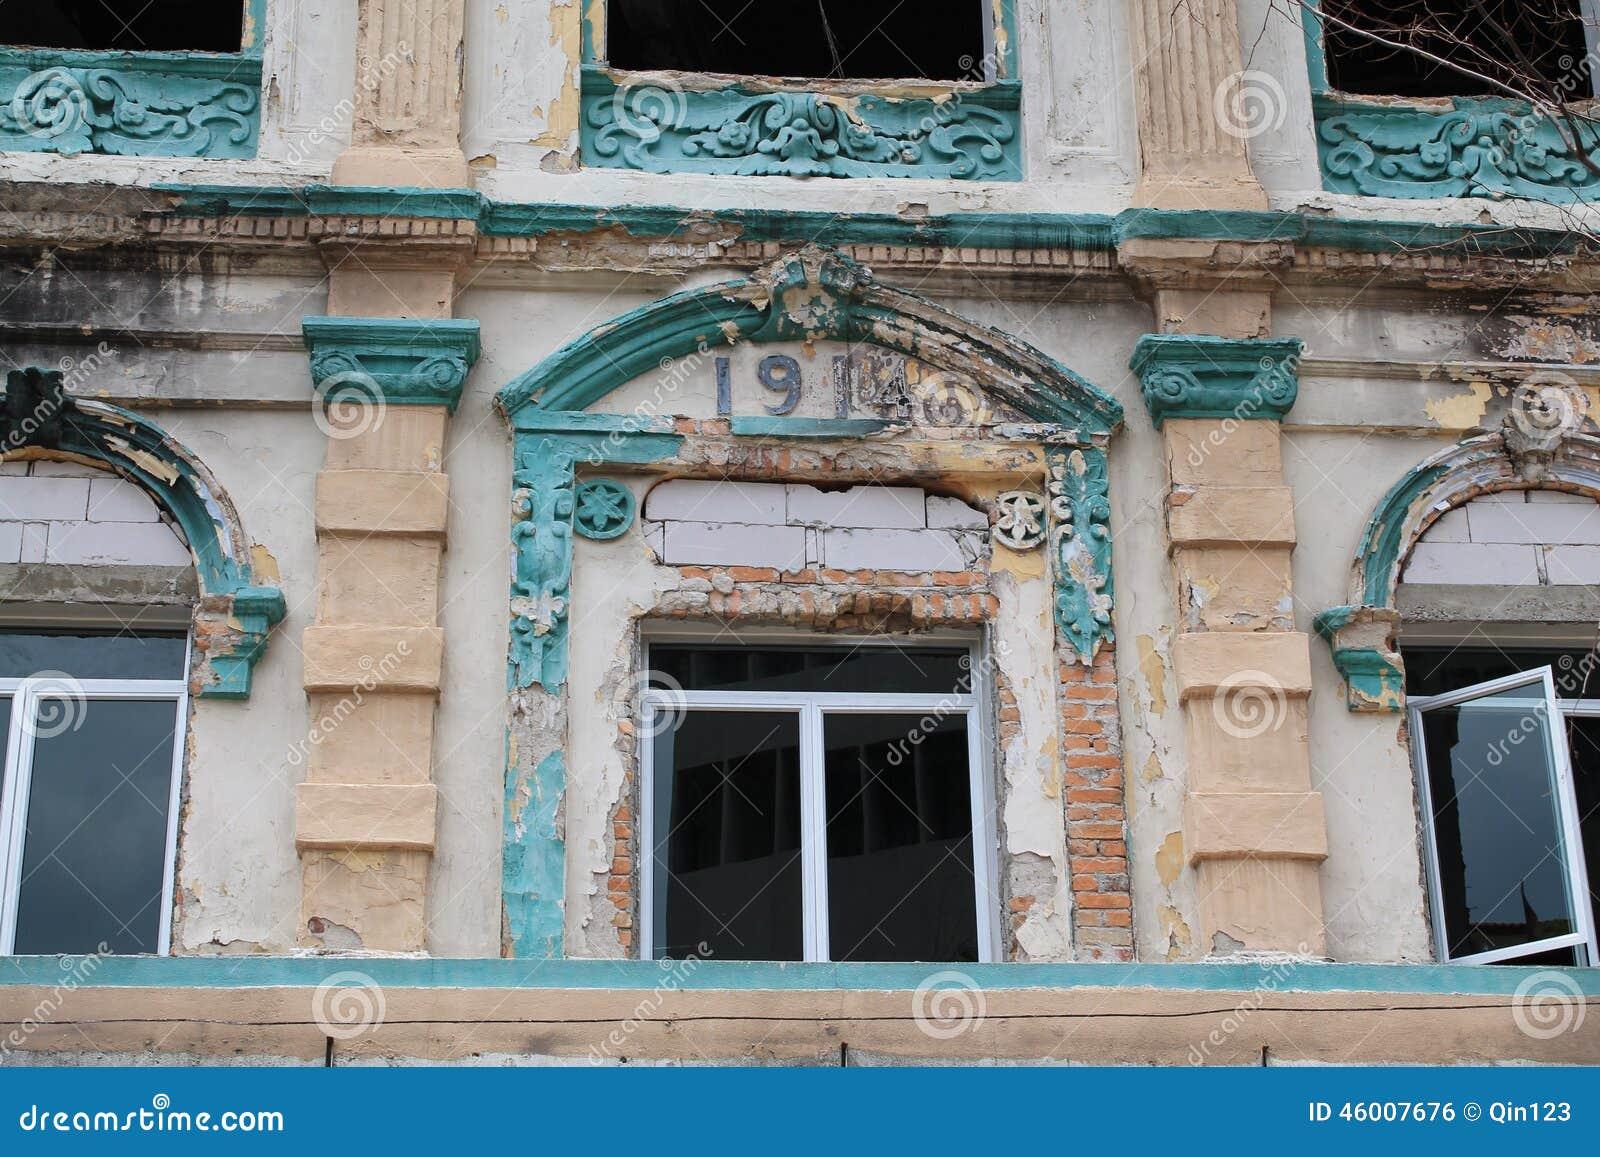 Europe Style Classic Windows Building Stock Photo Image